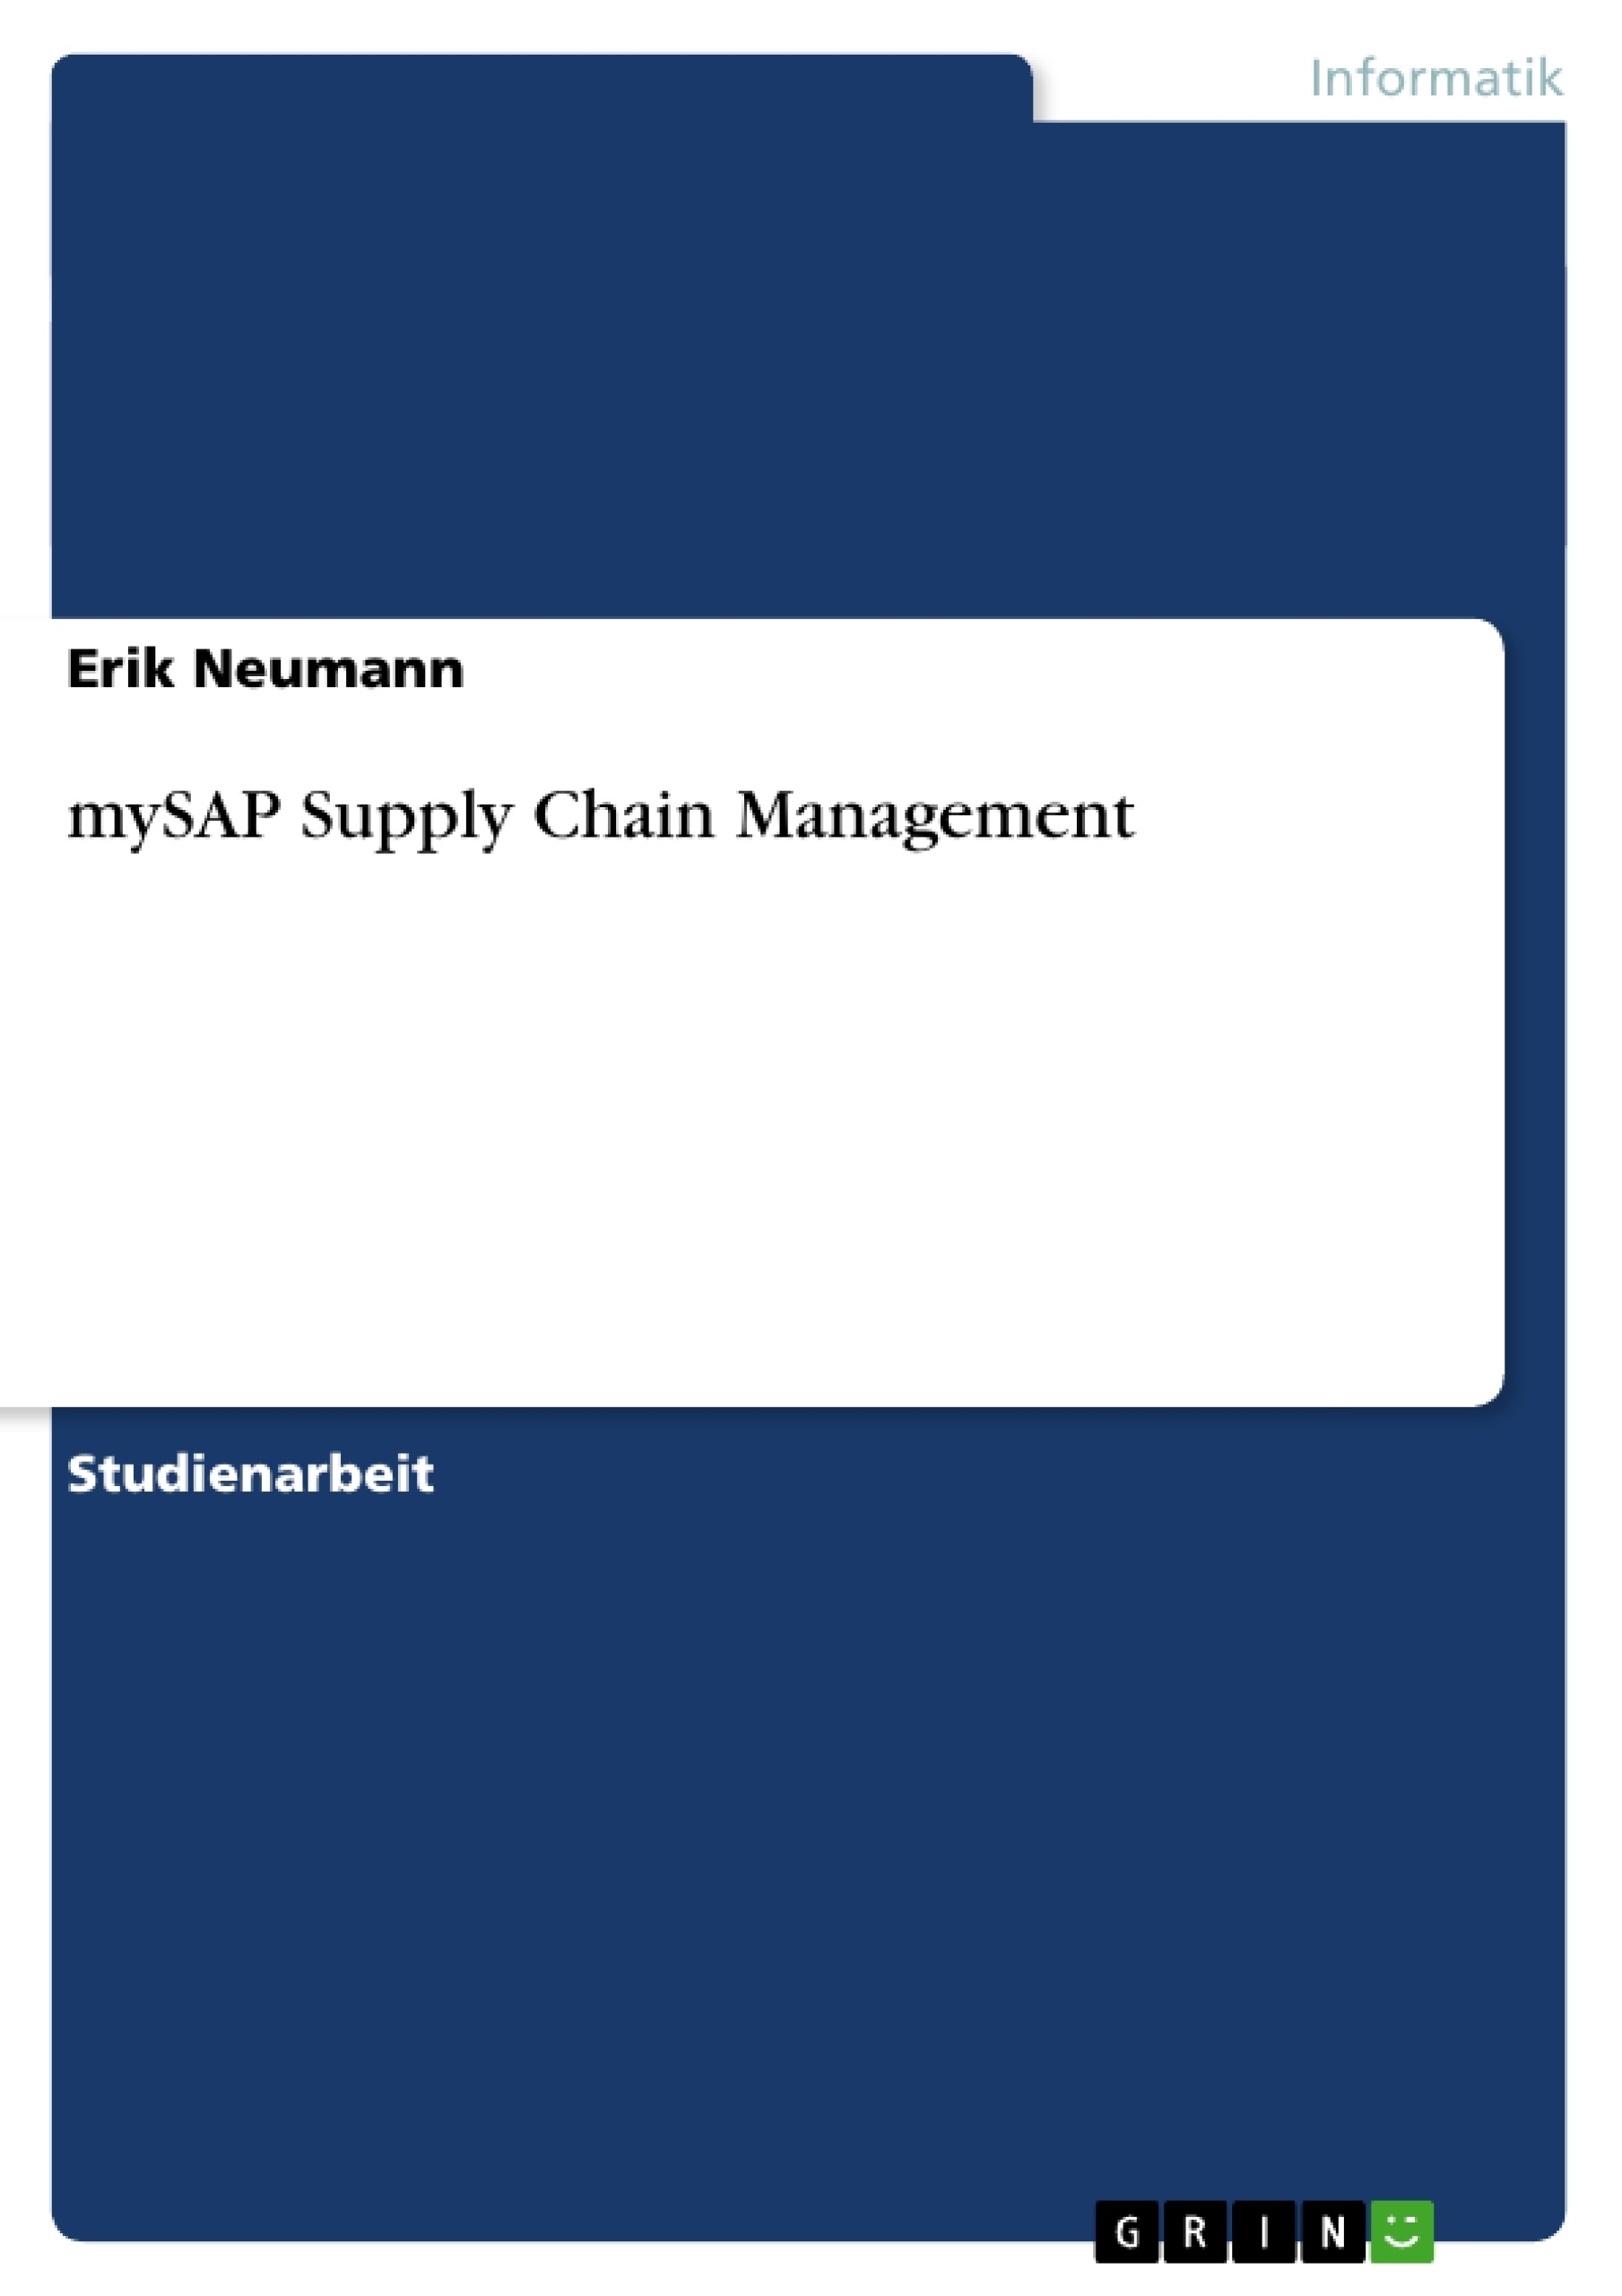 Titel: mySAP Supply Chain Management